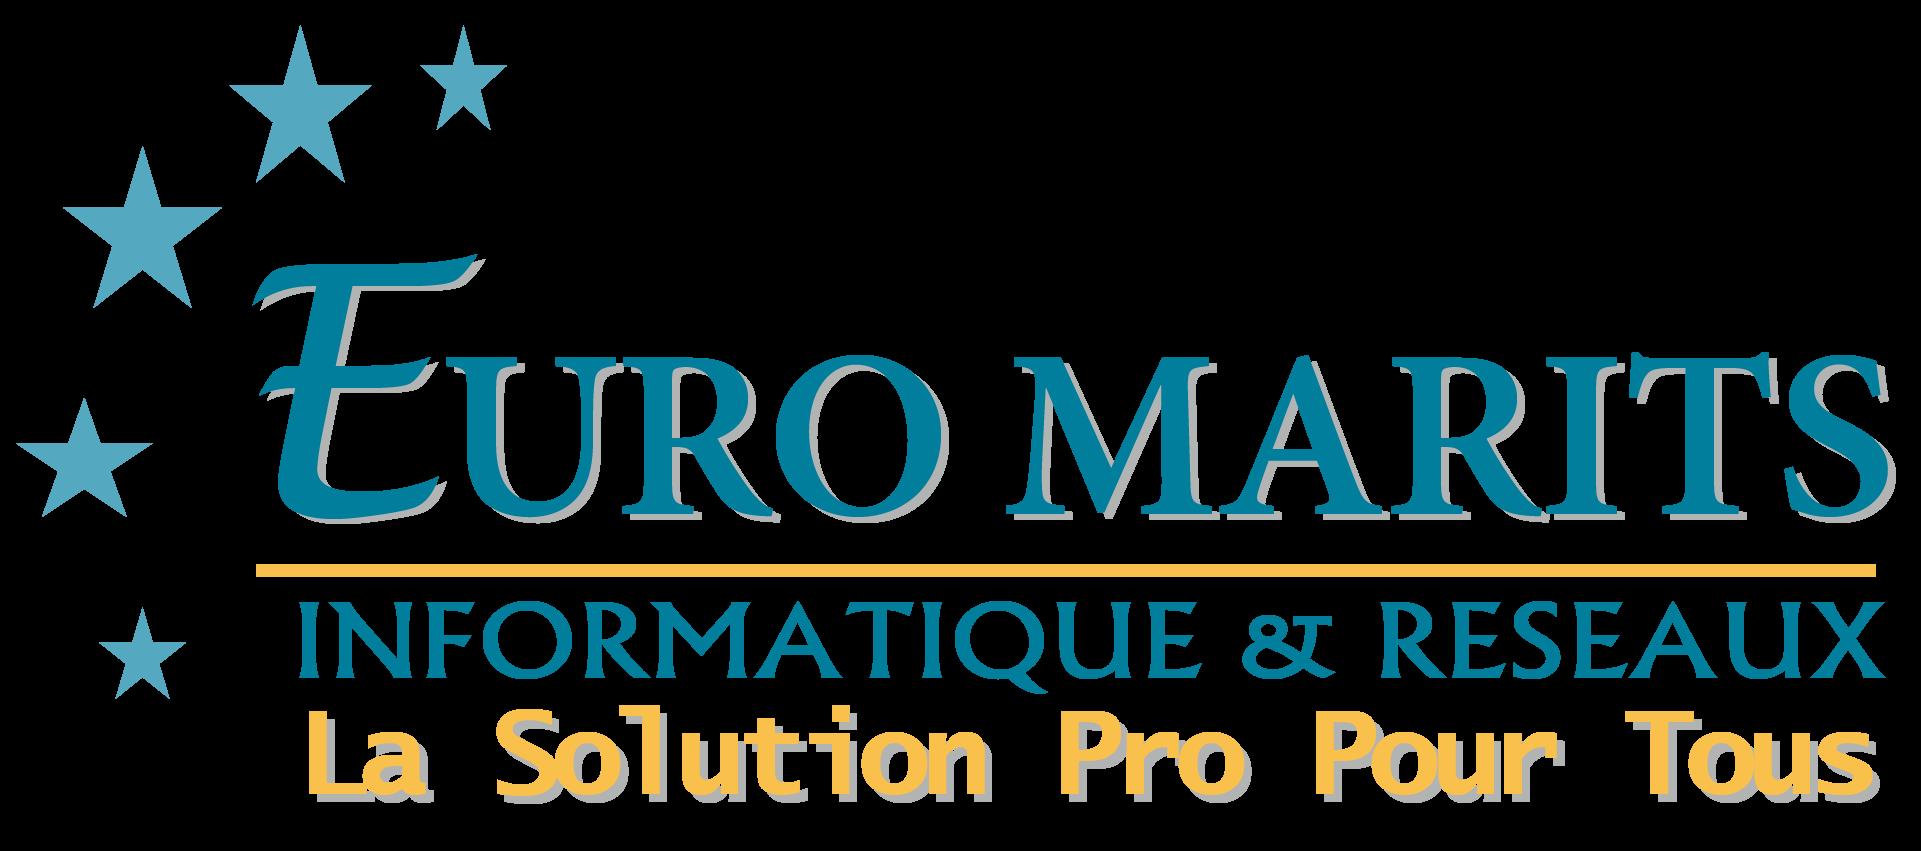 Euro Marits Services En IngénierieInformatique